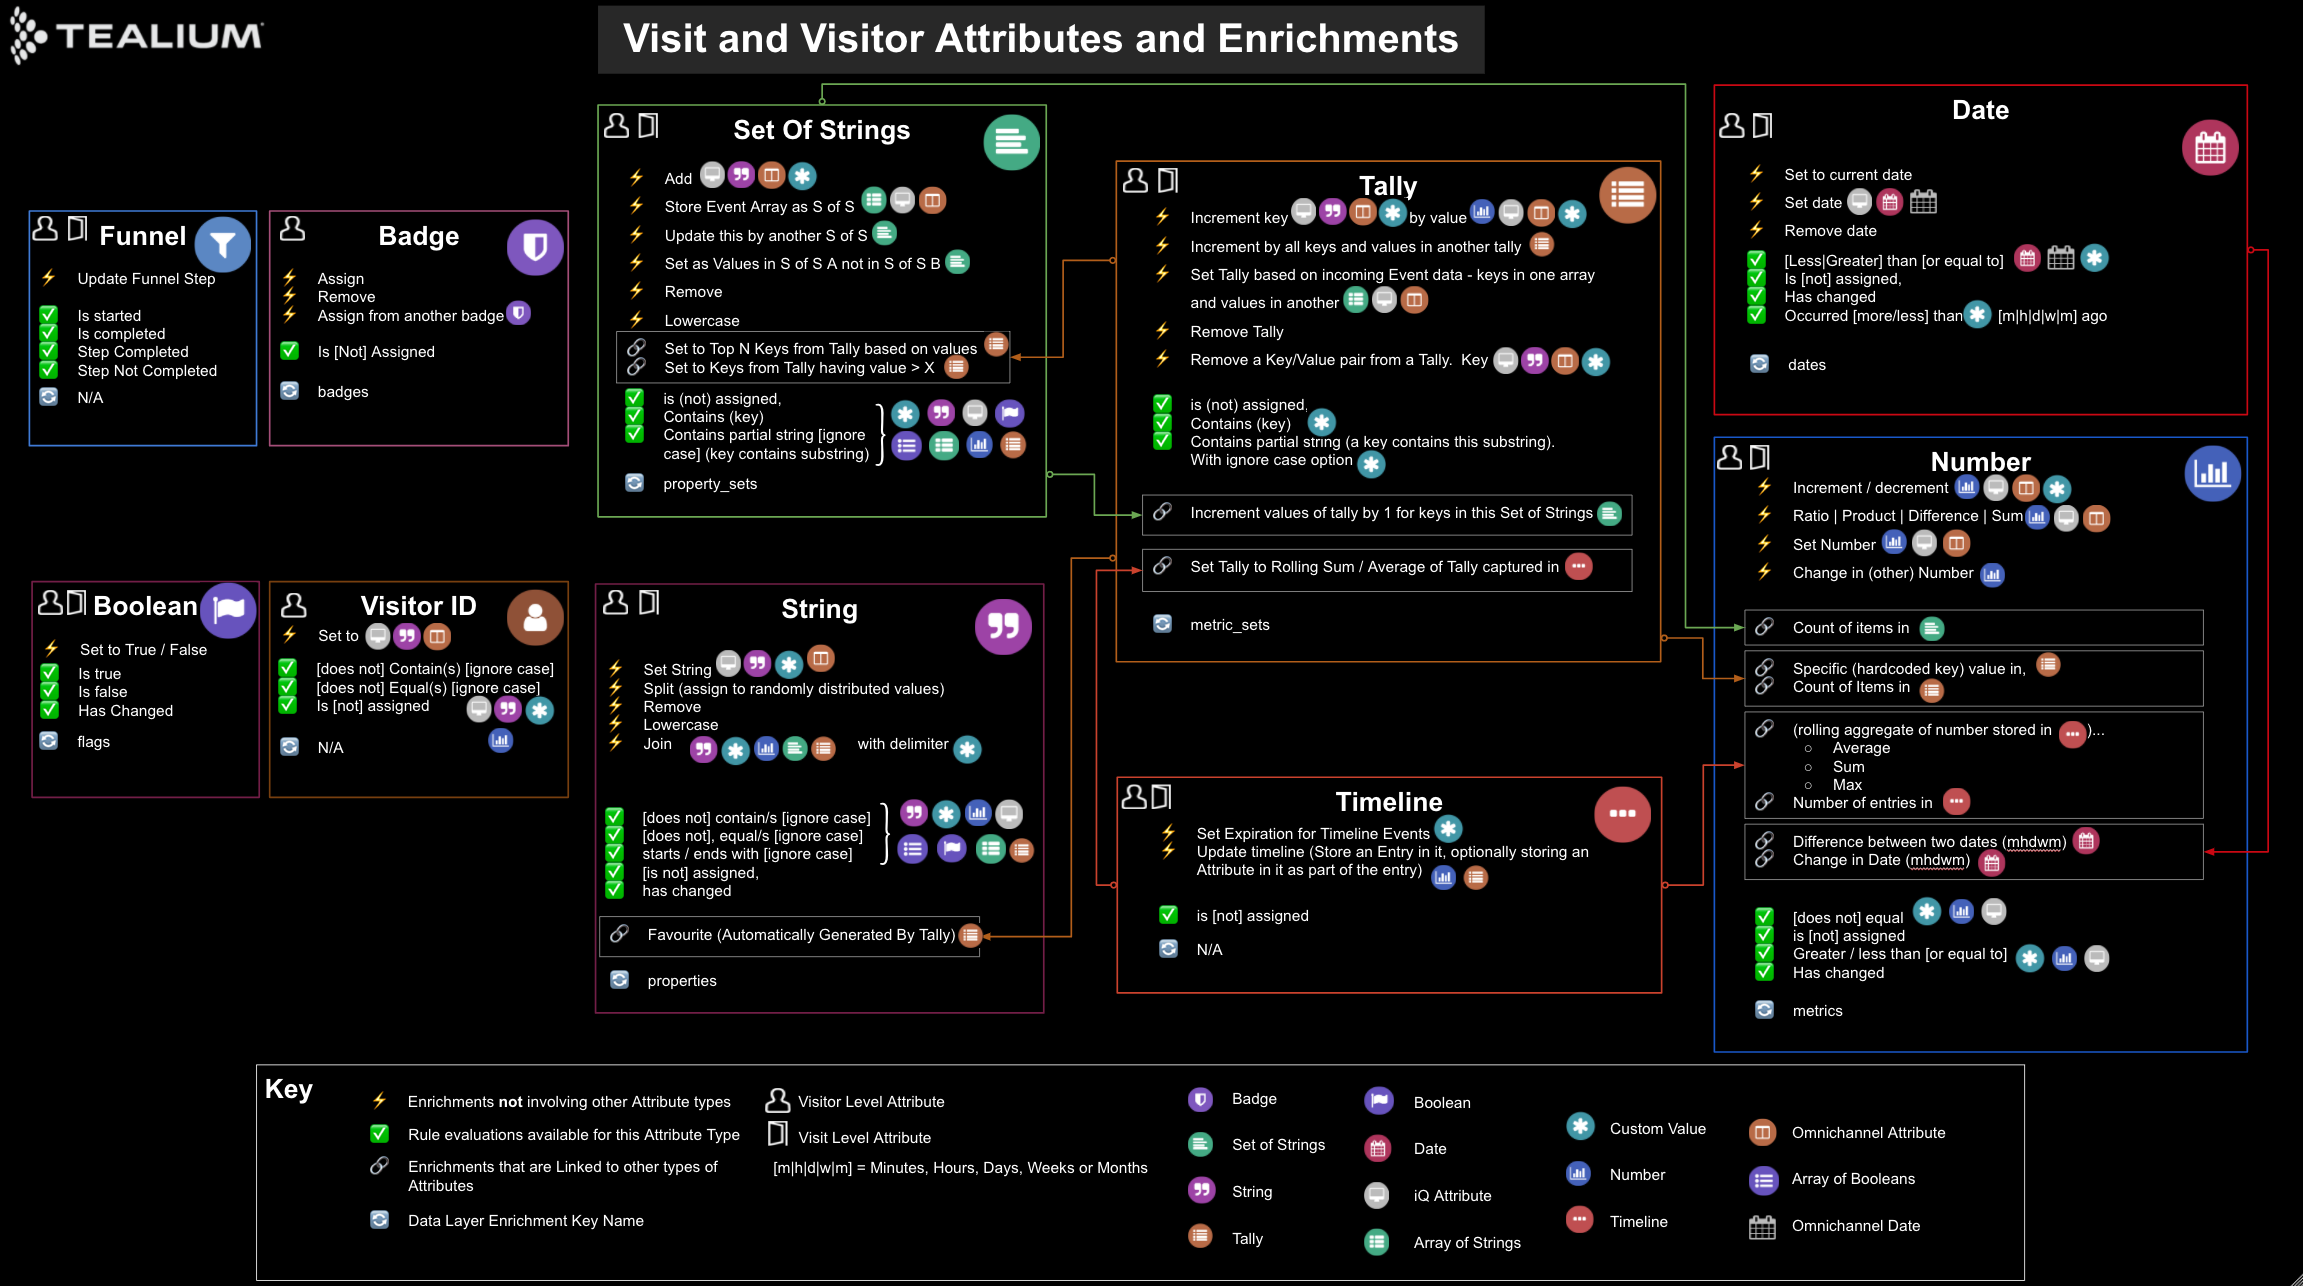 udh-visit-visitor-attributes-enrichments-diagram.png